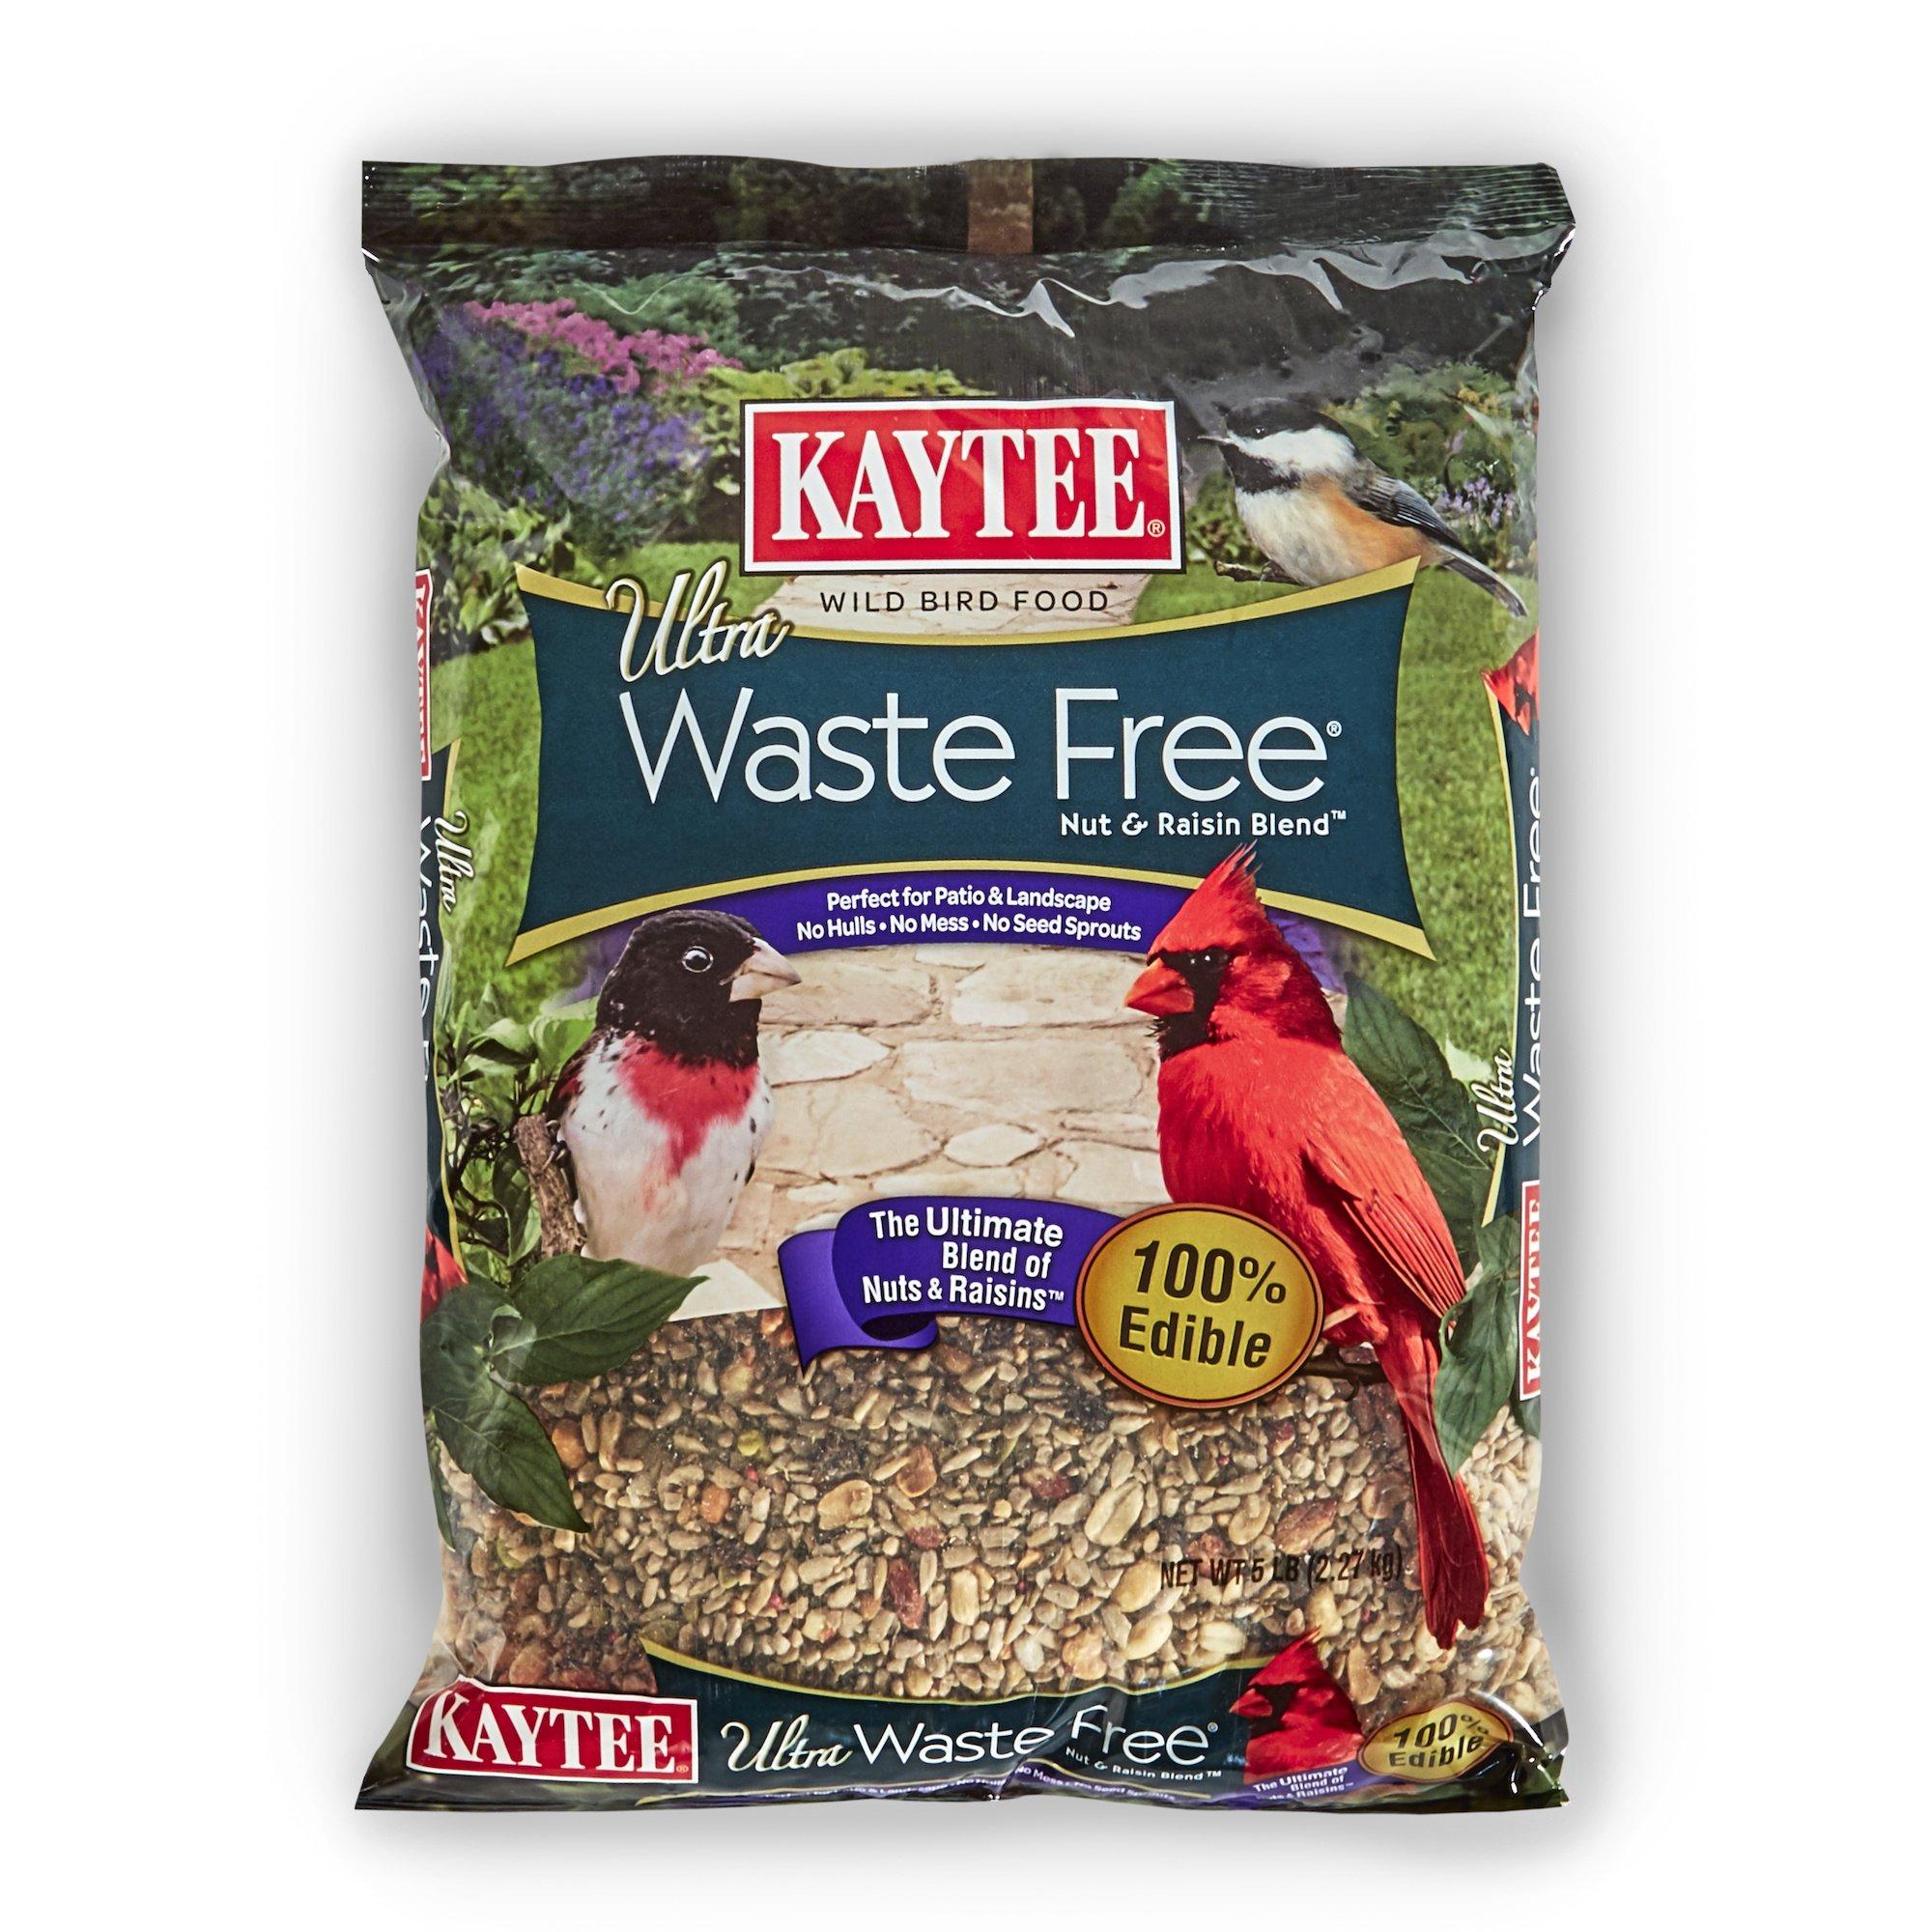 Kaytee Waste Free Nut and Raisin Blend, 5-Pound